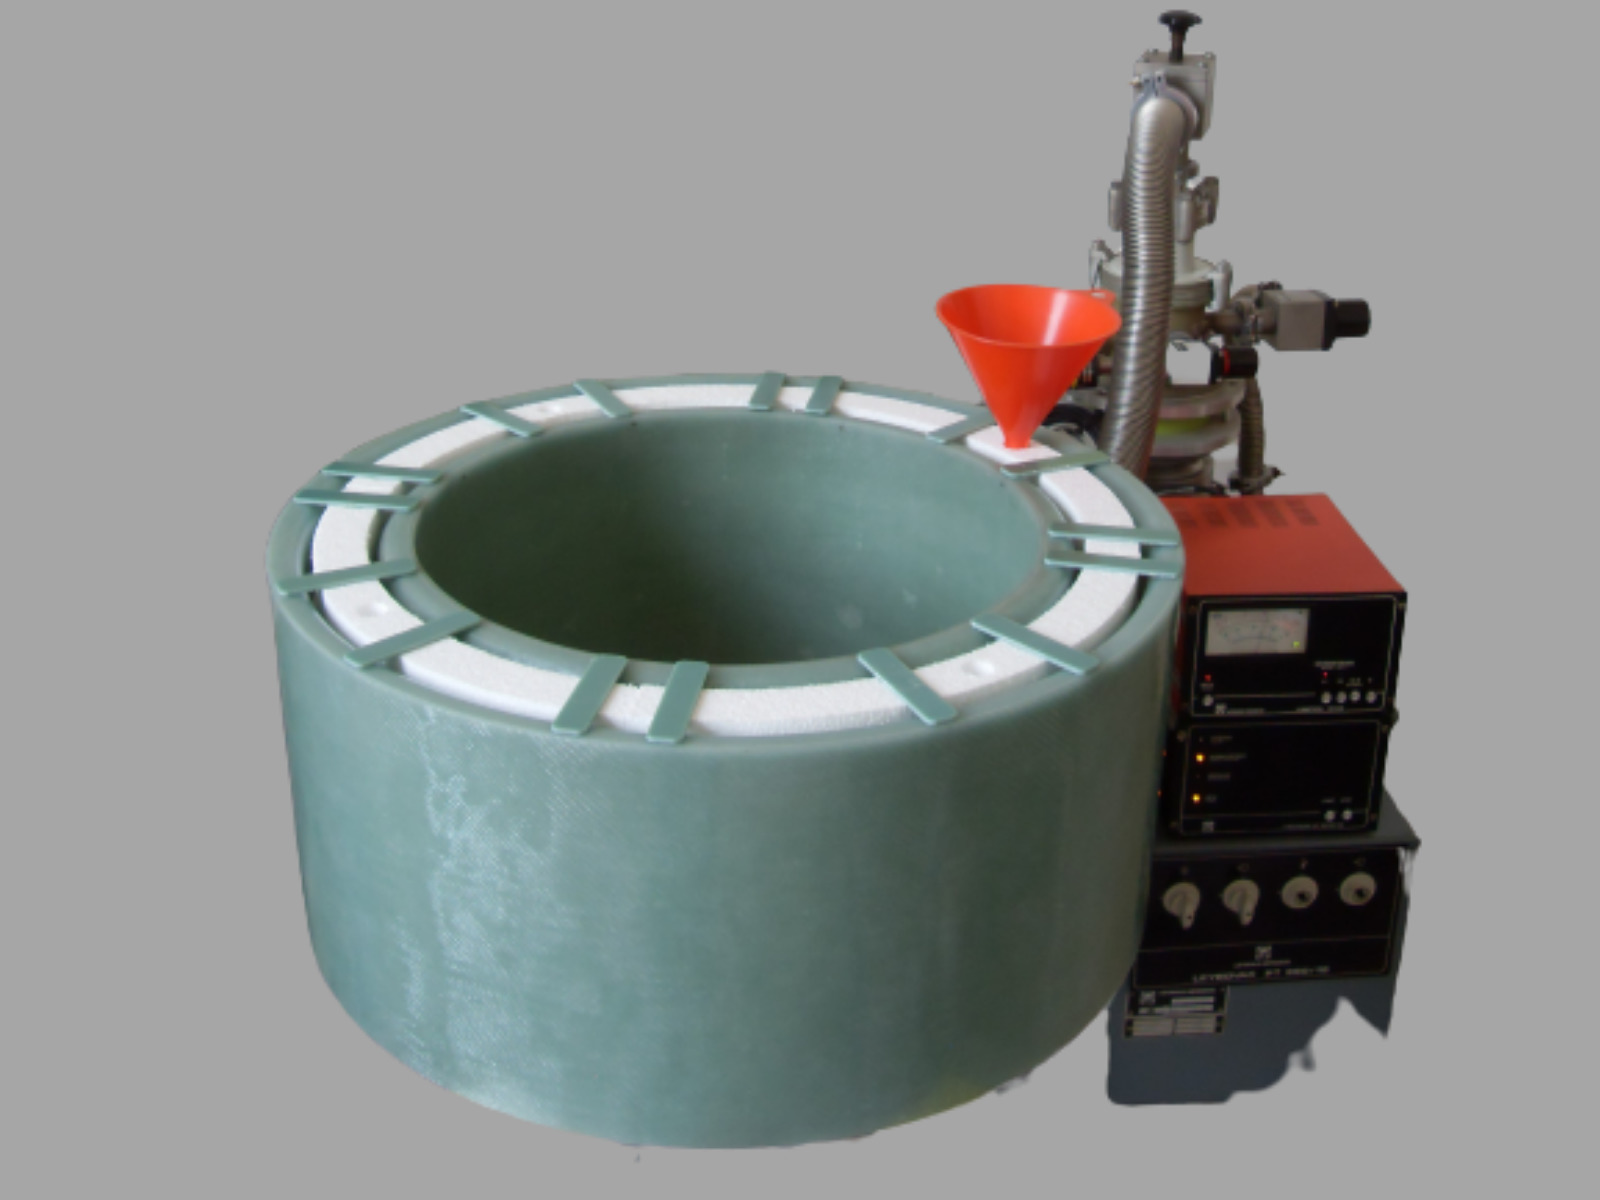 800 mm non-metalic cryostat